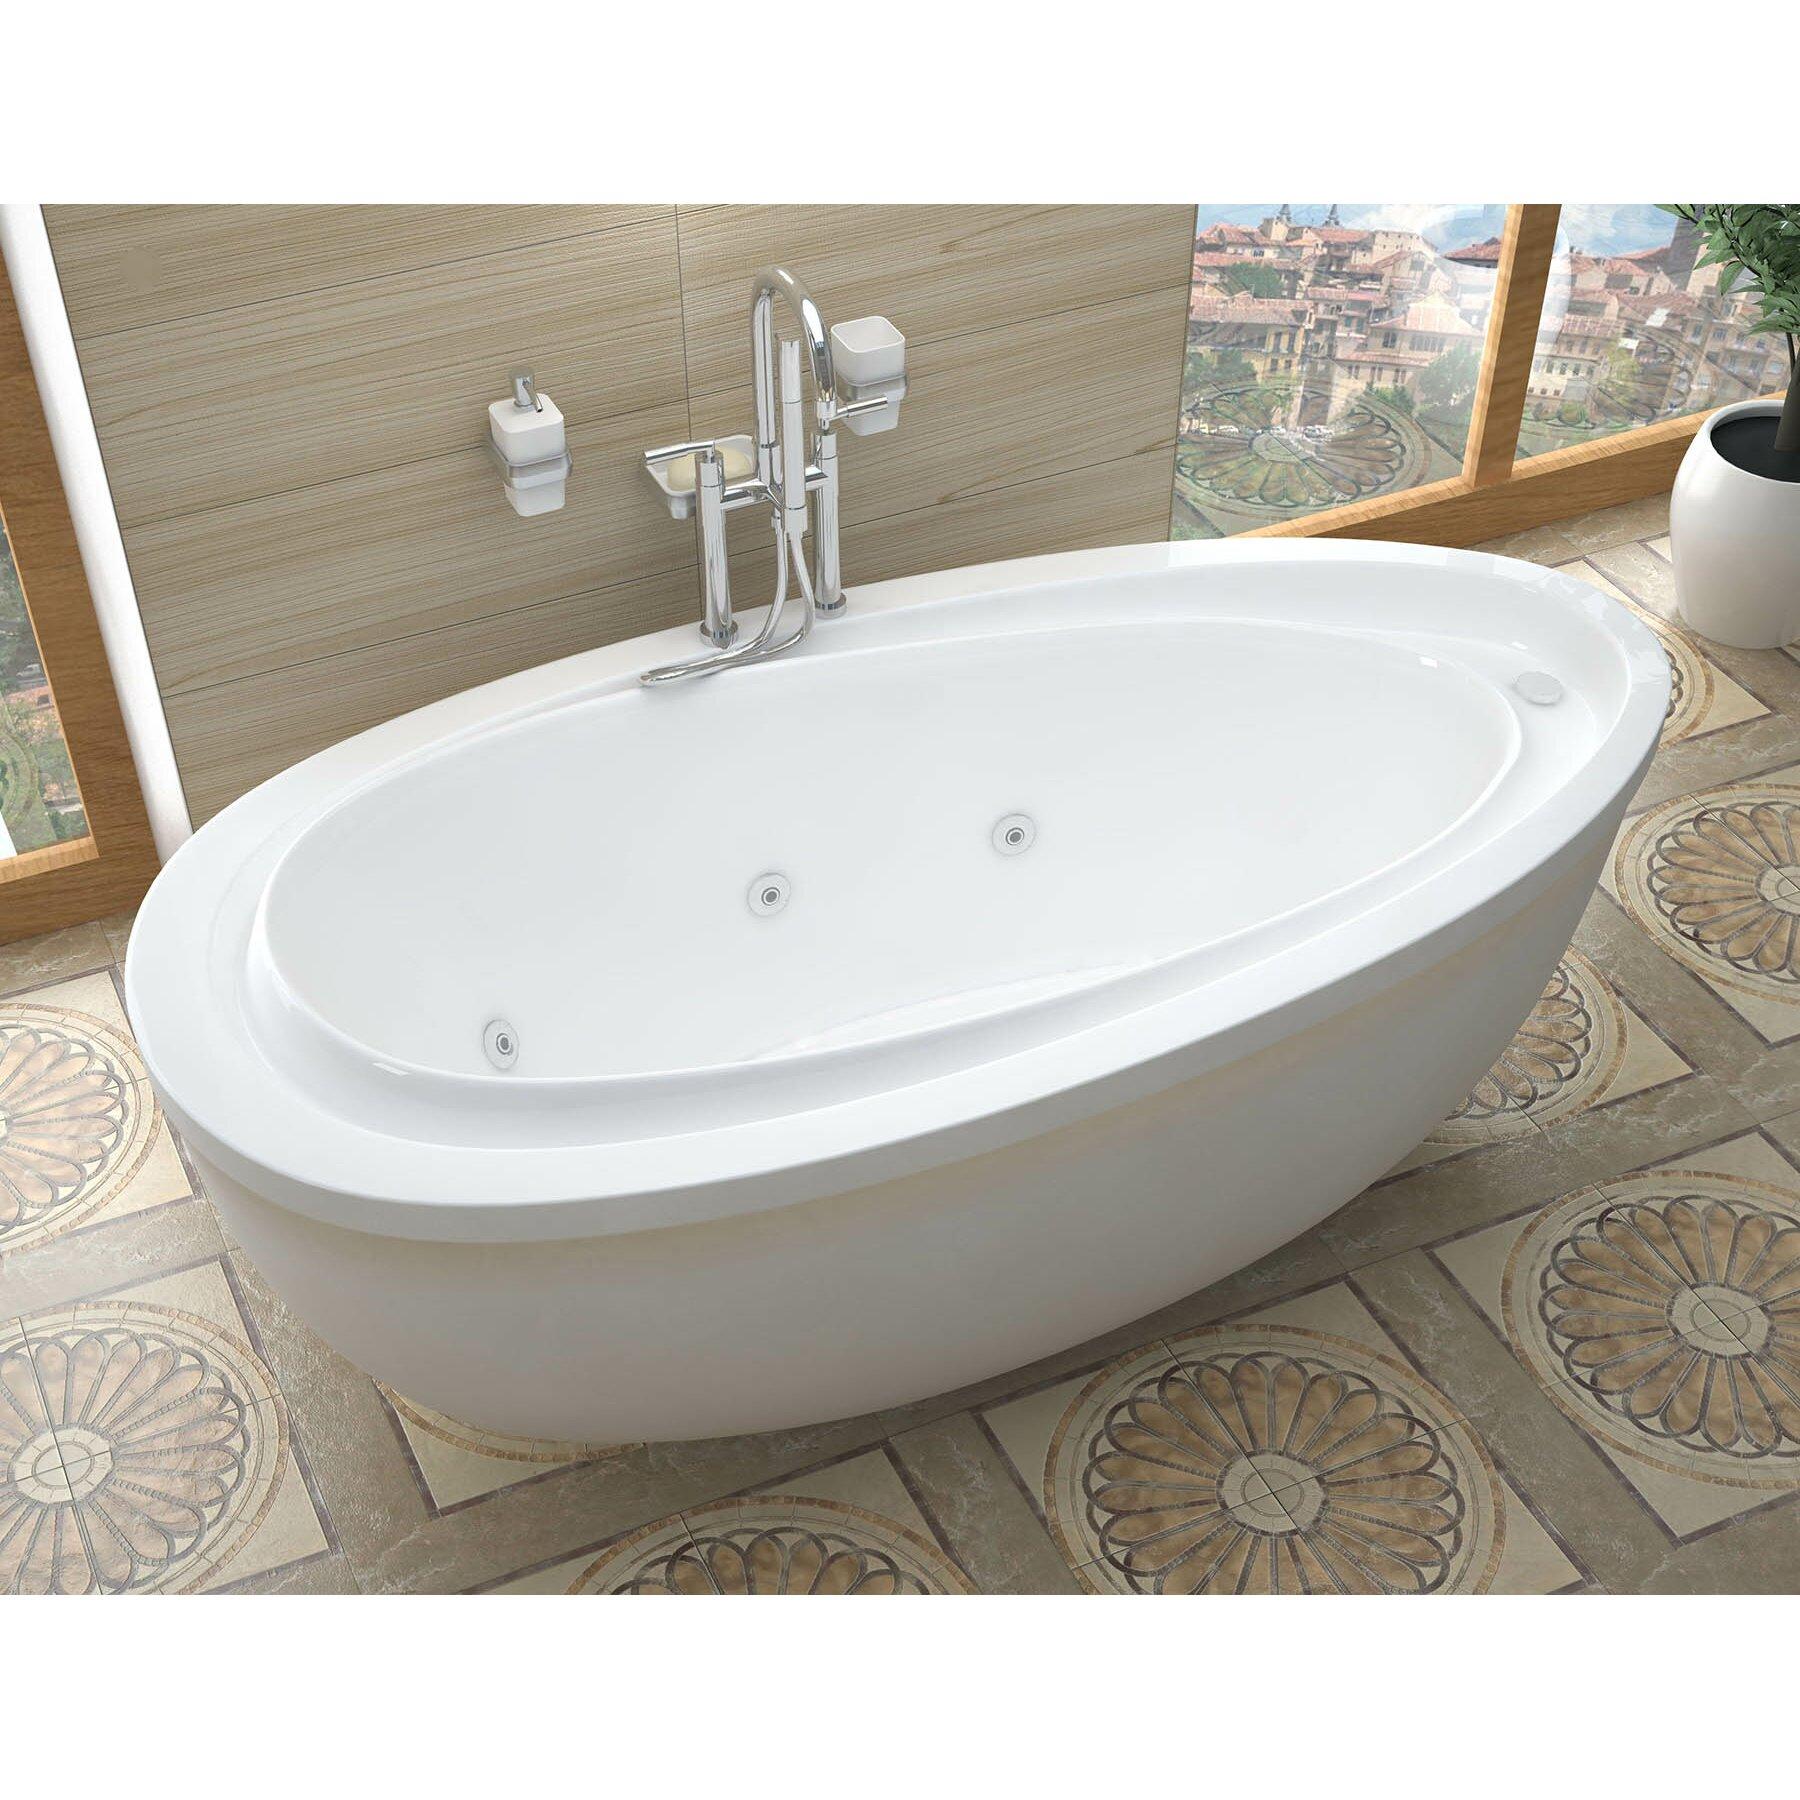 Freestanding Tubs Youll Love Wayfair - Freestanding tub end drain